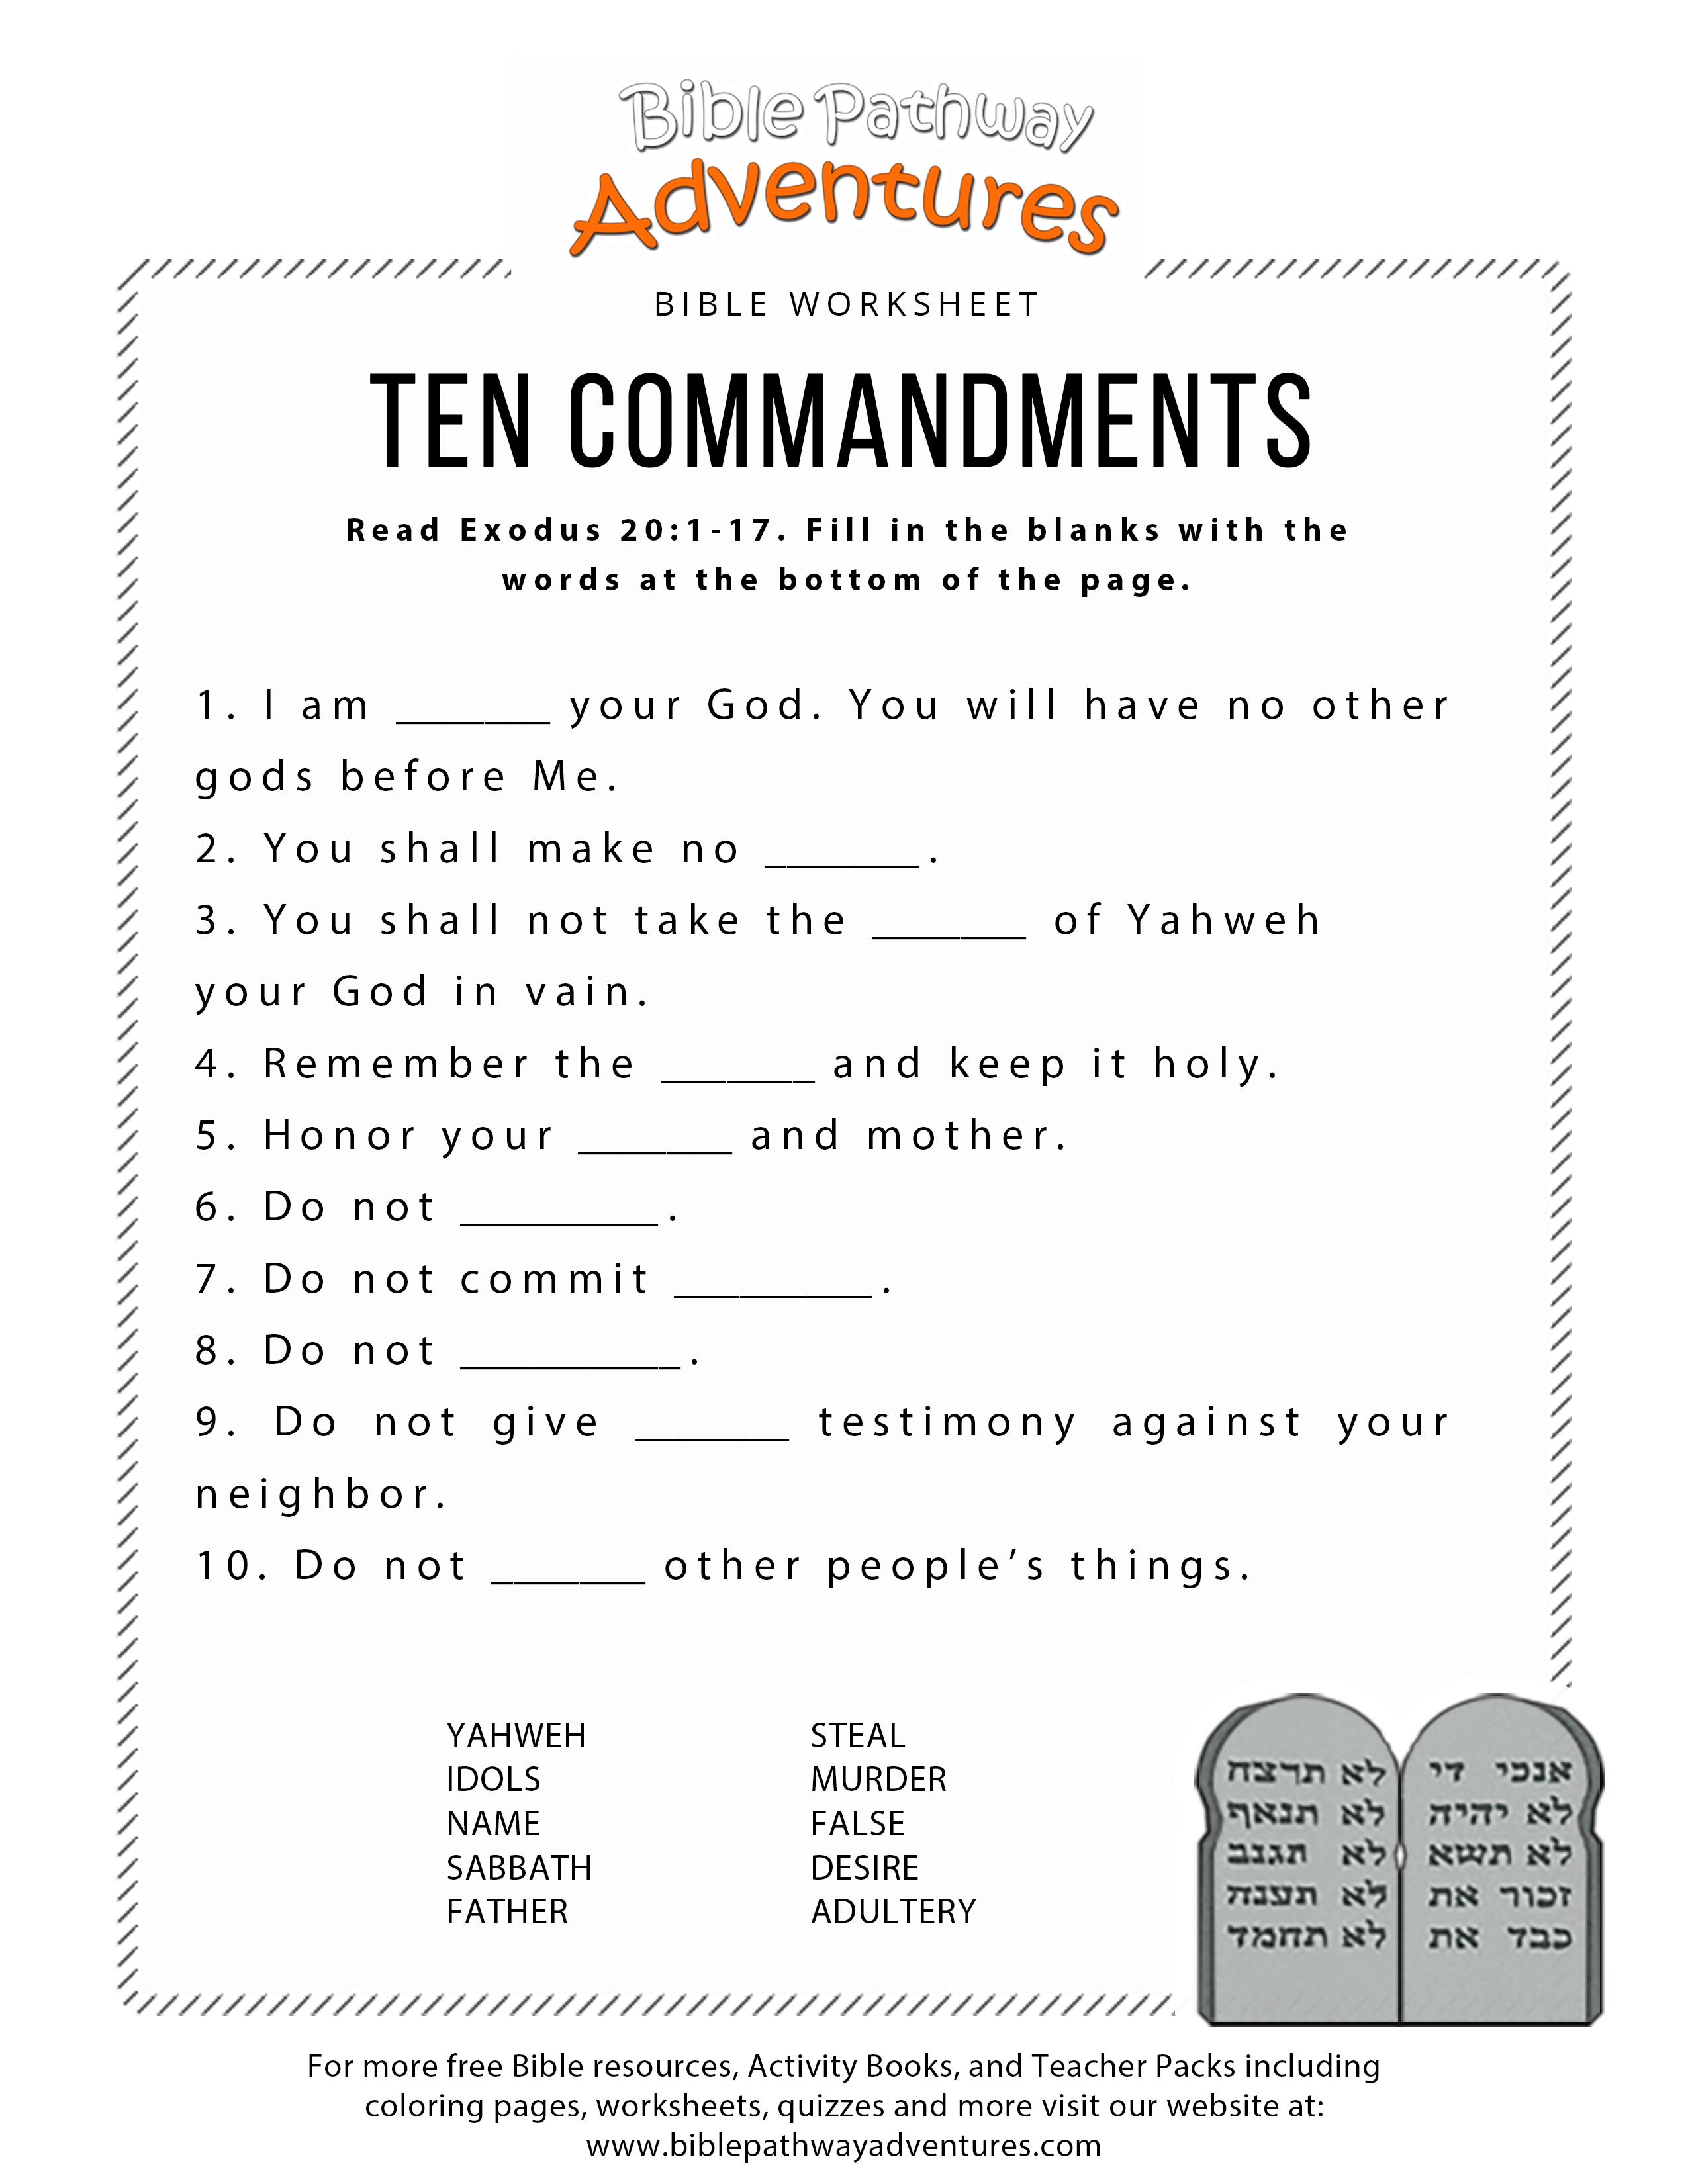 Ten Commandments Worksheet For Kids   Worksheets For Psr   Bible - Free Printable Bible Games For Kids